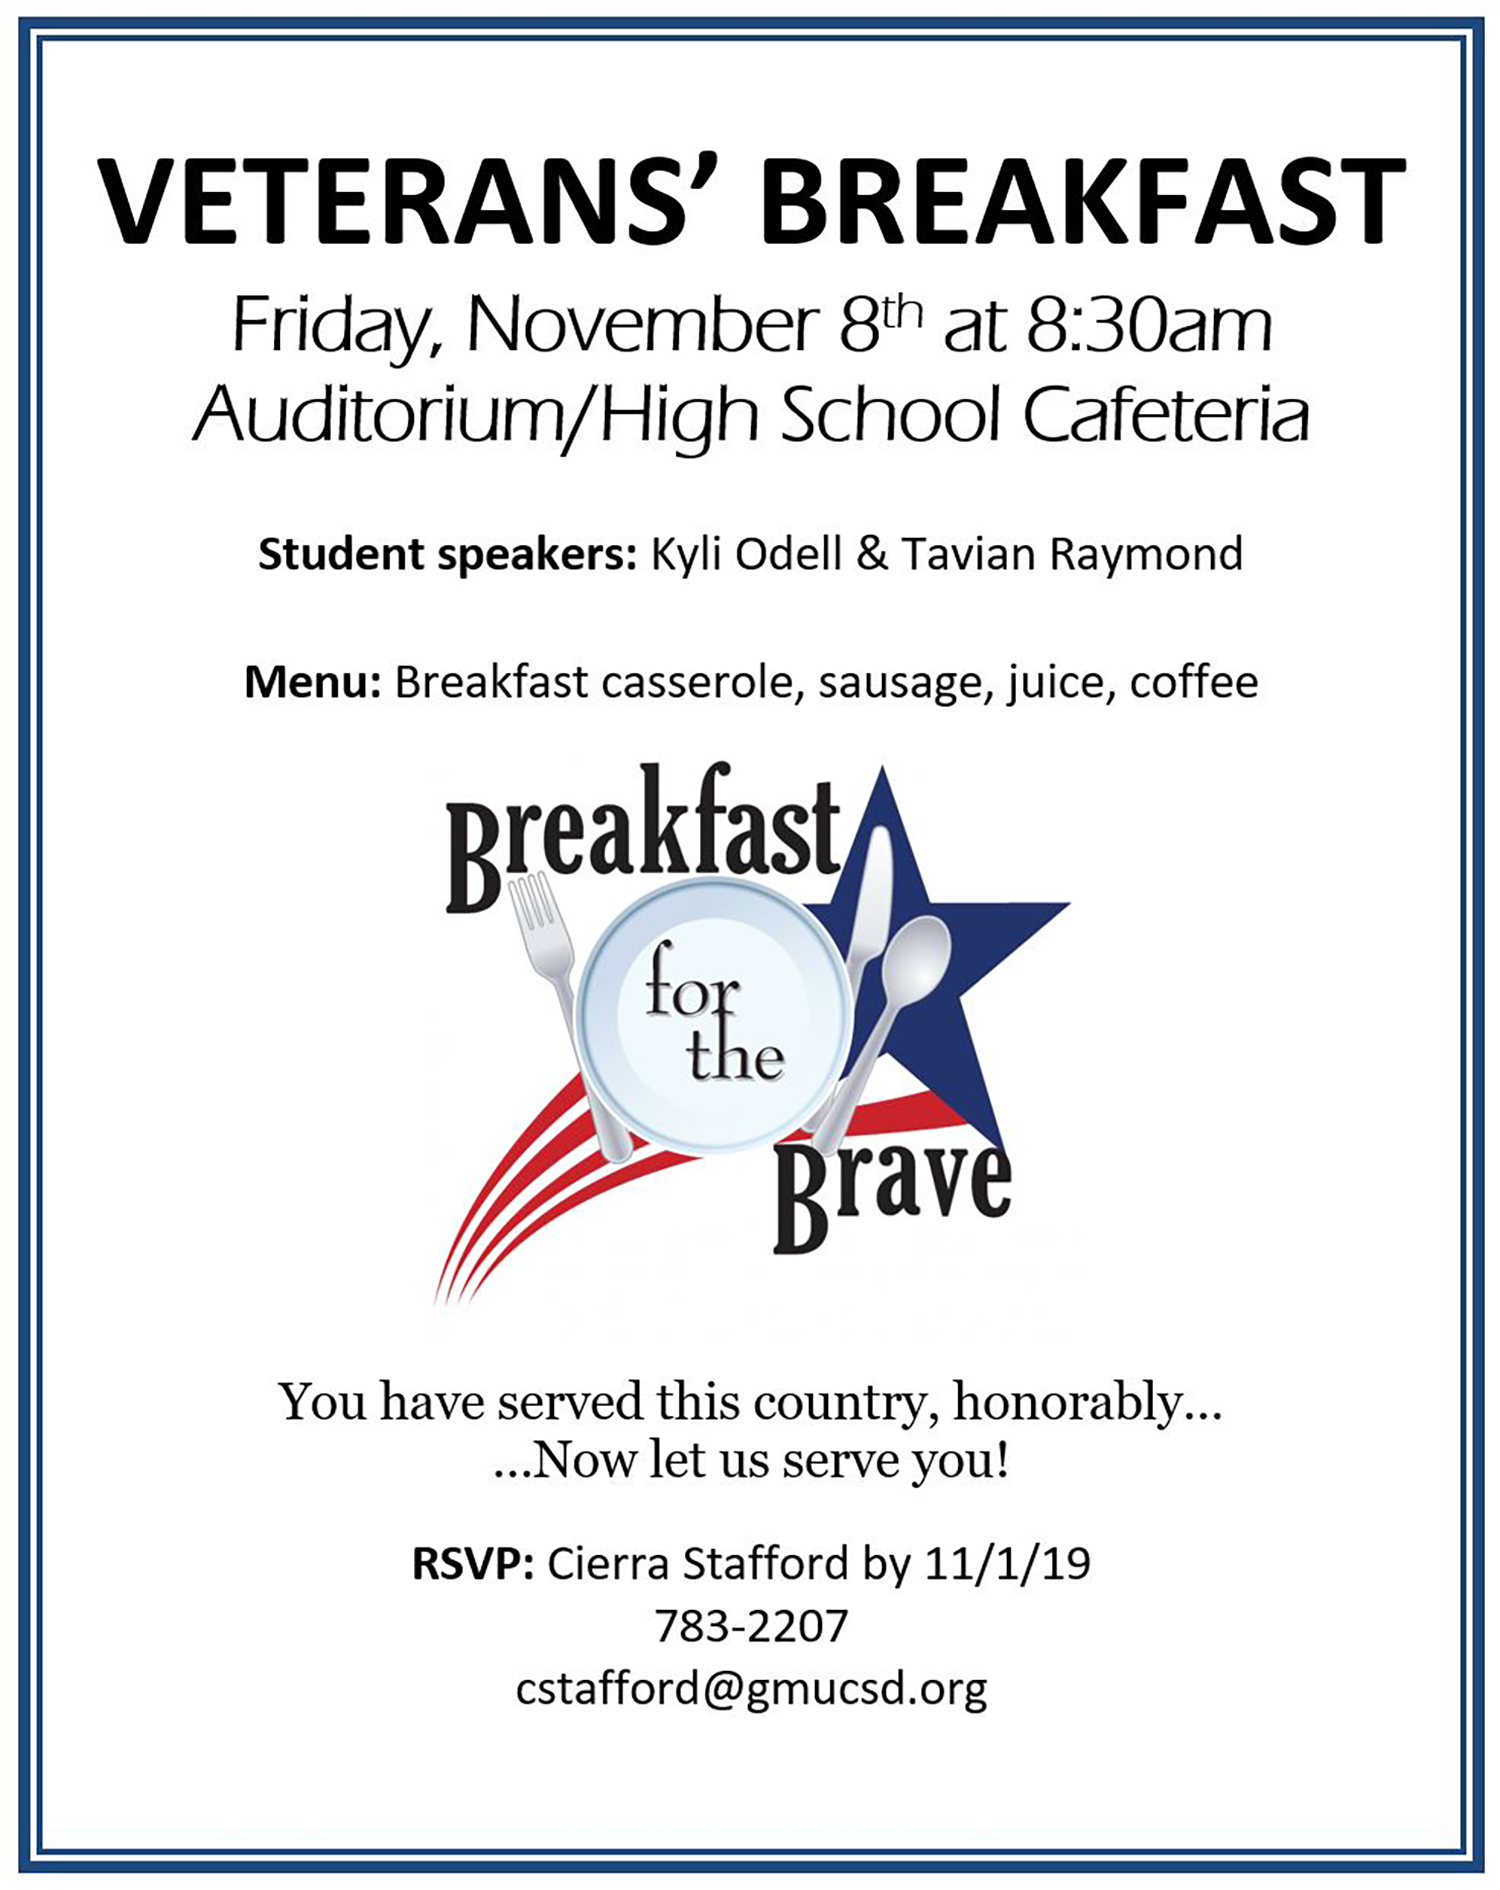 Veterans Breakfast Flyer 2019